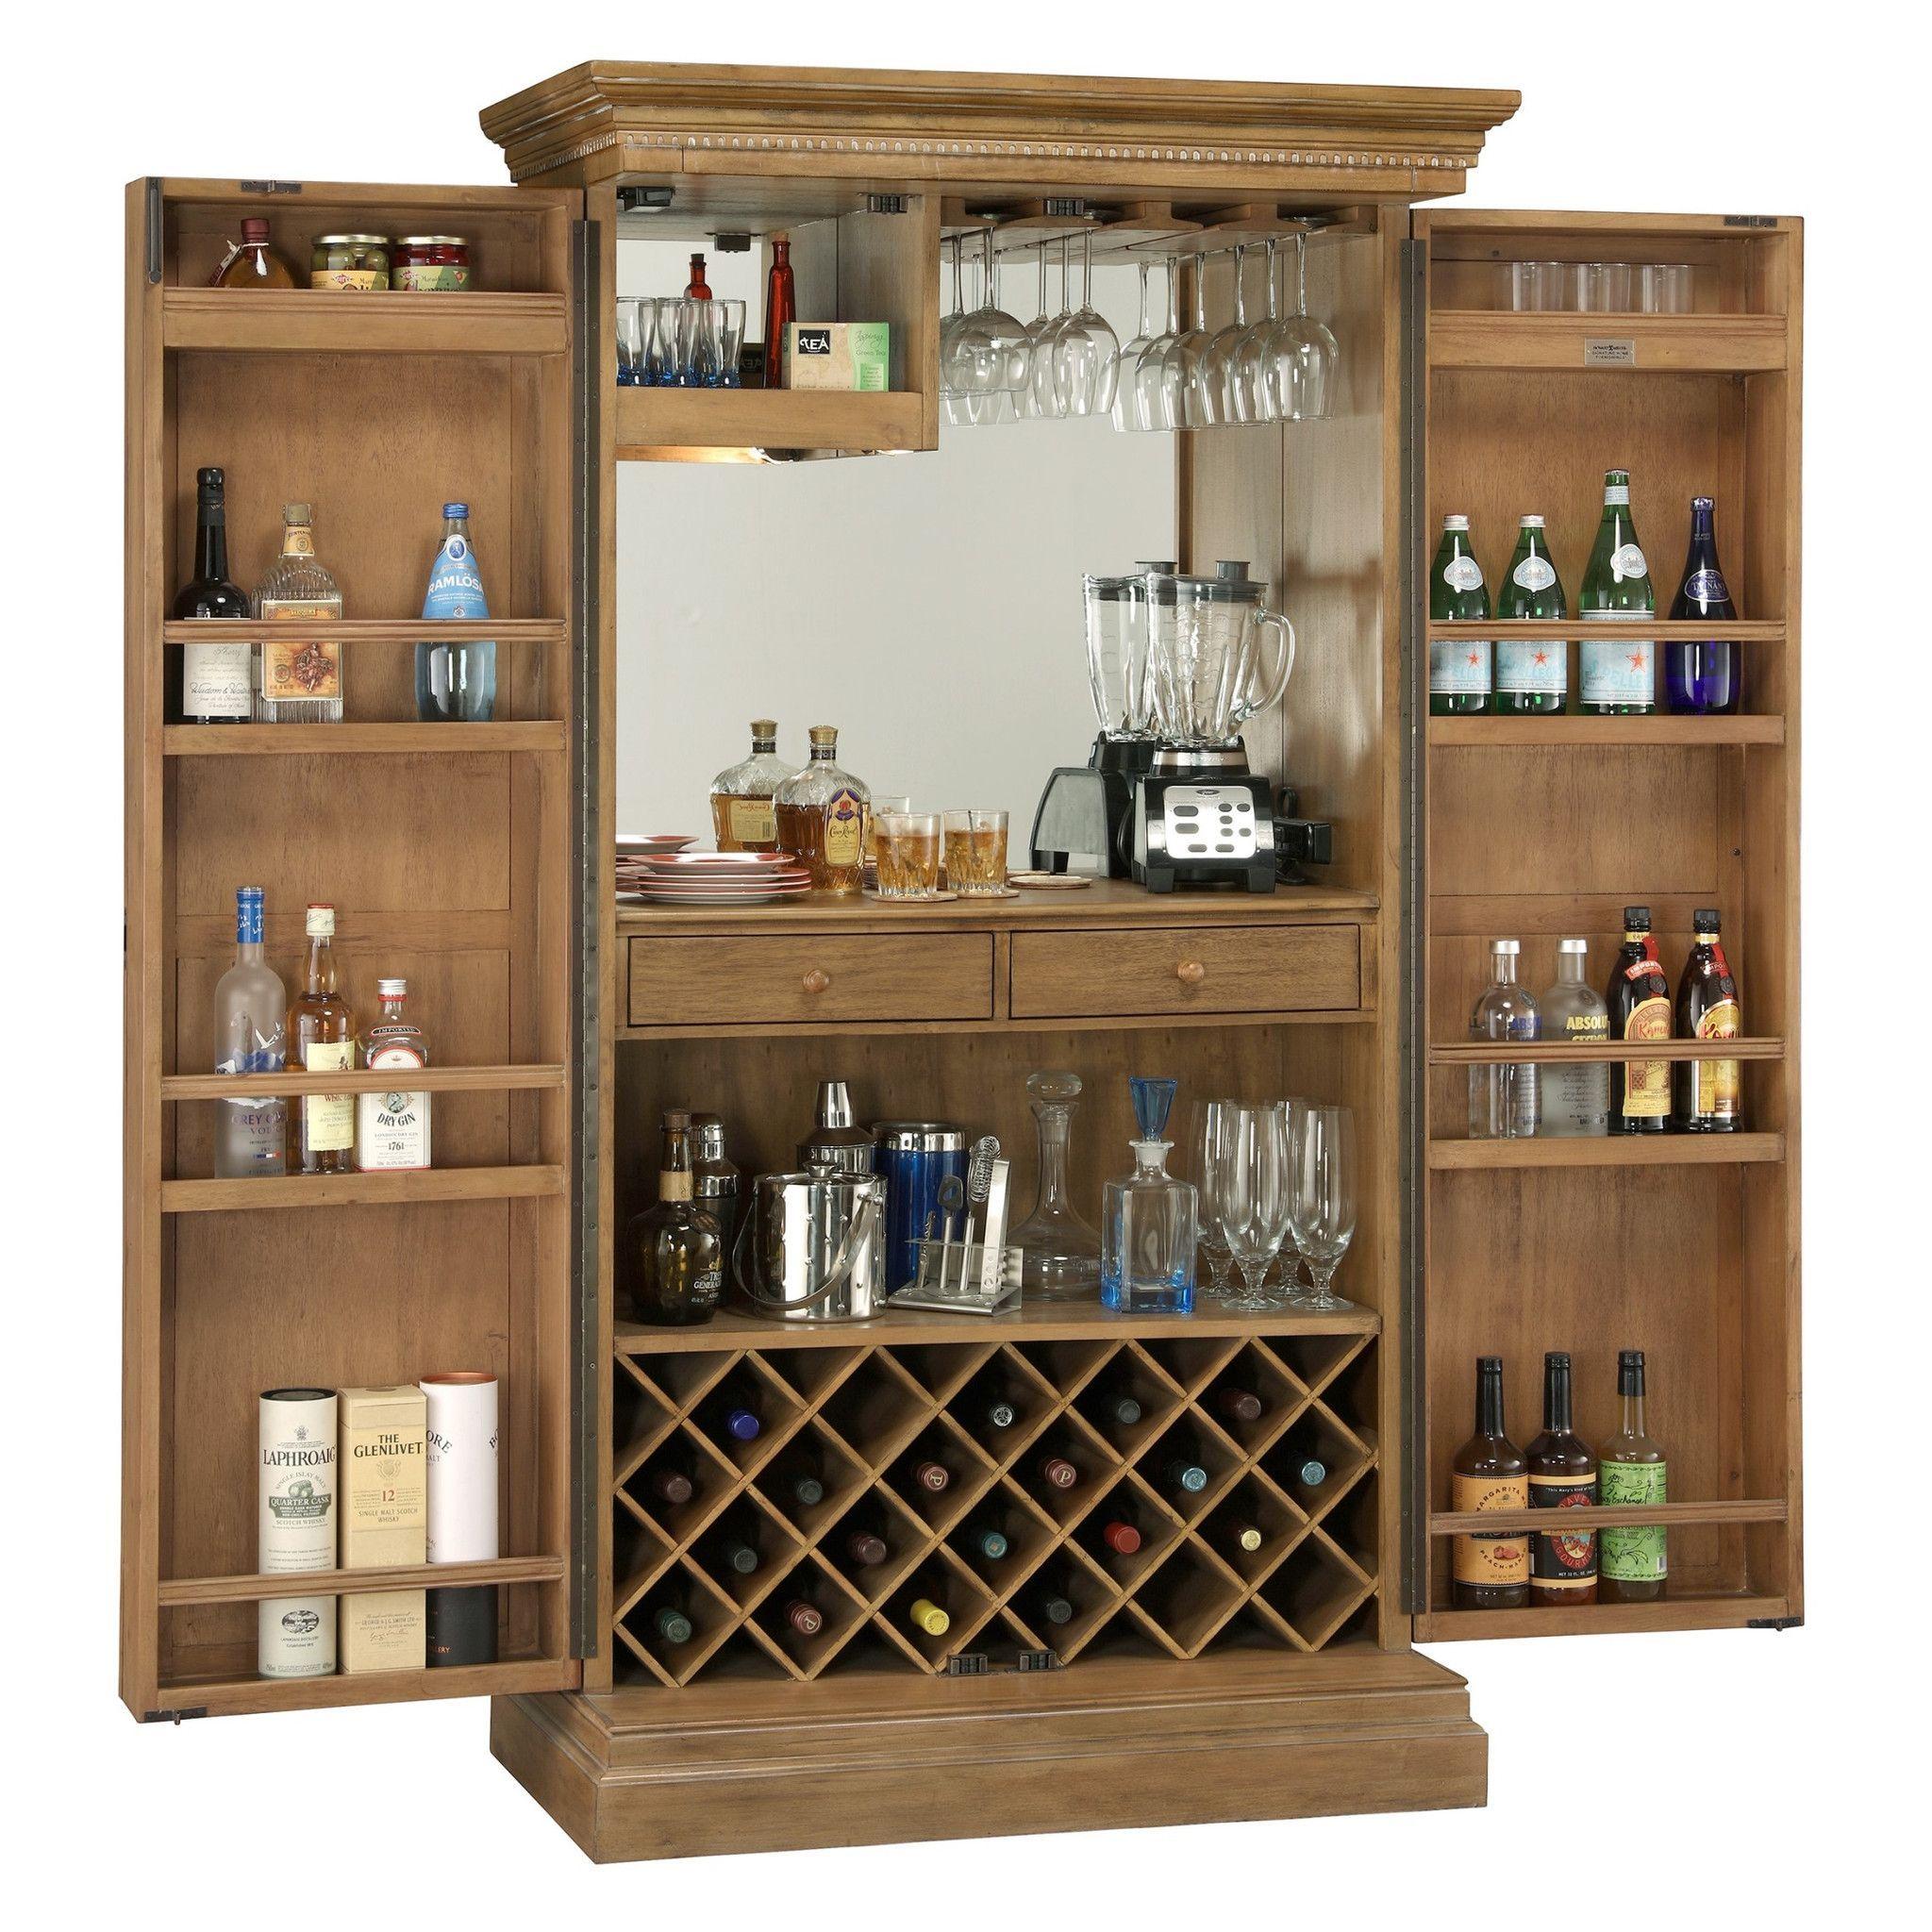 Howard Miller Clare Valley Wine Bar Cabinet 695 152 Wine Bar Cabinet Bar Storage Cabinet Armoire Bar